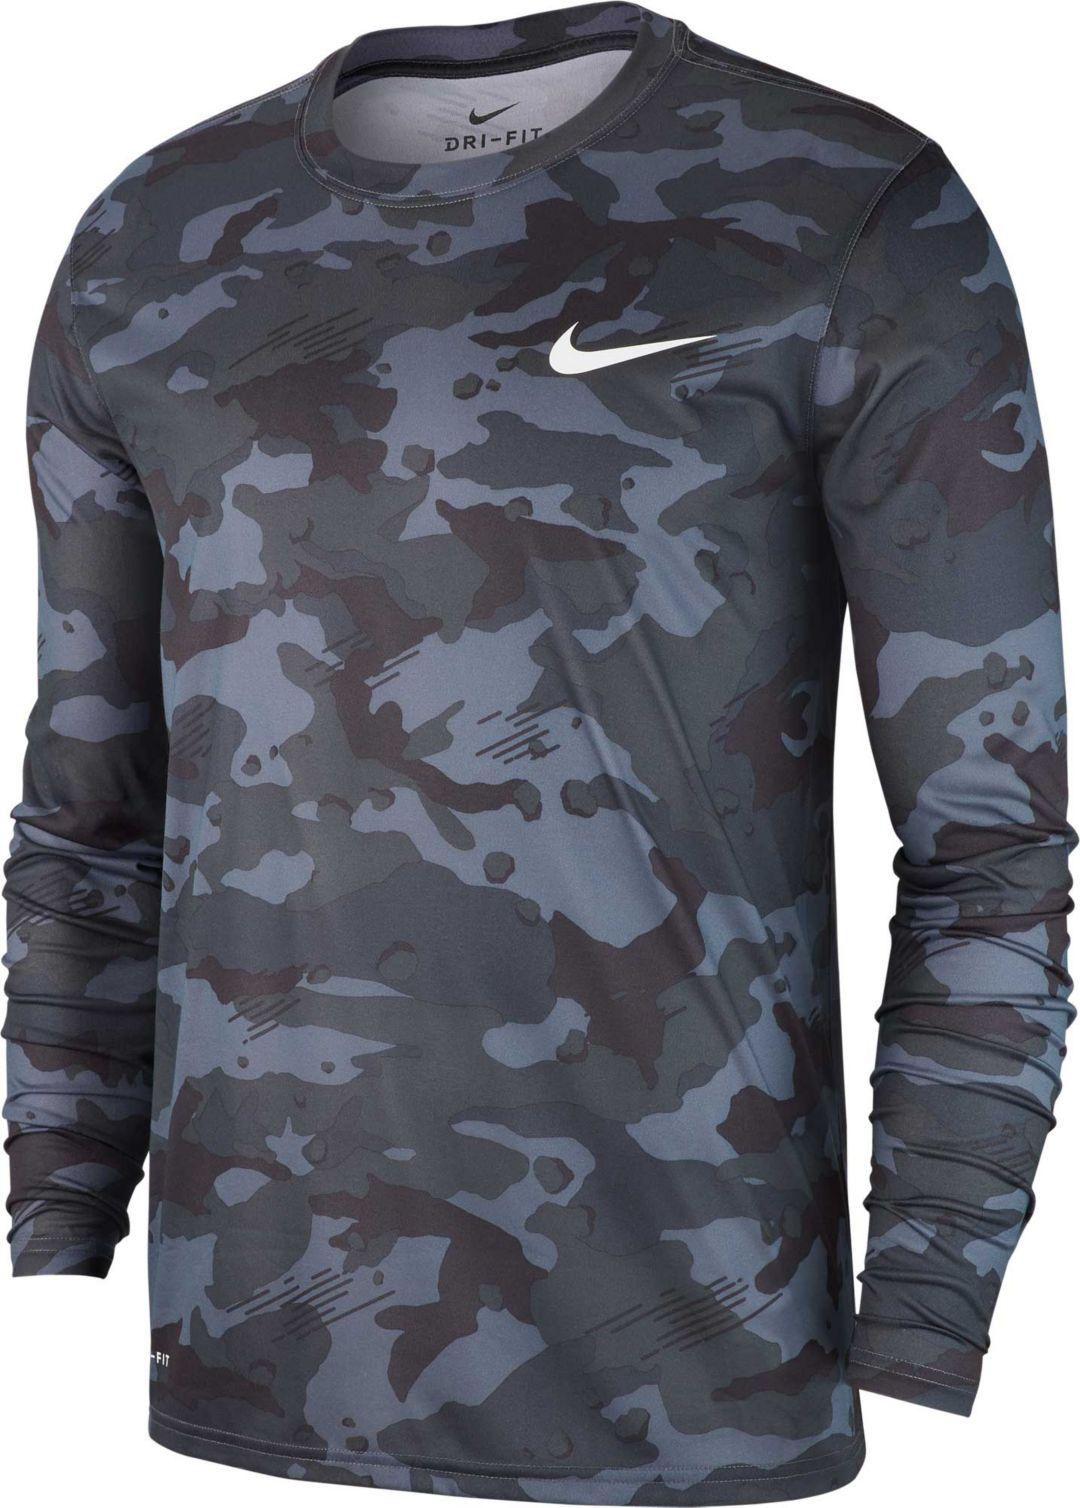 bf2bb781d27bf7 Nike Men's Dry Legend Camo Long Sleeve Tee. noImageFound. Previous